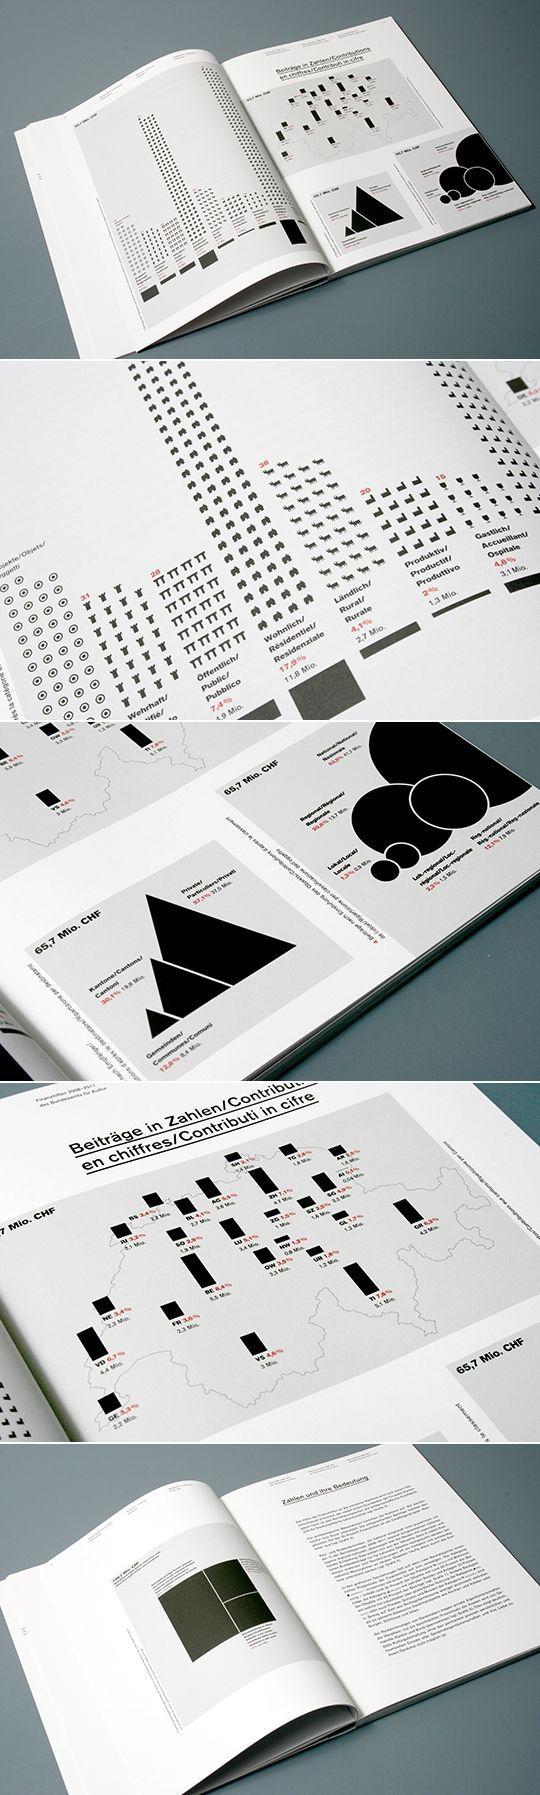 #information #design #infographic #infographics